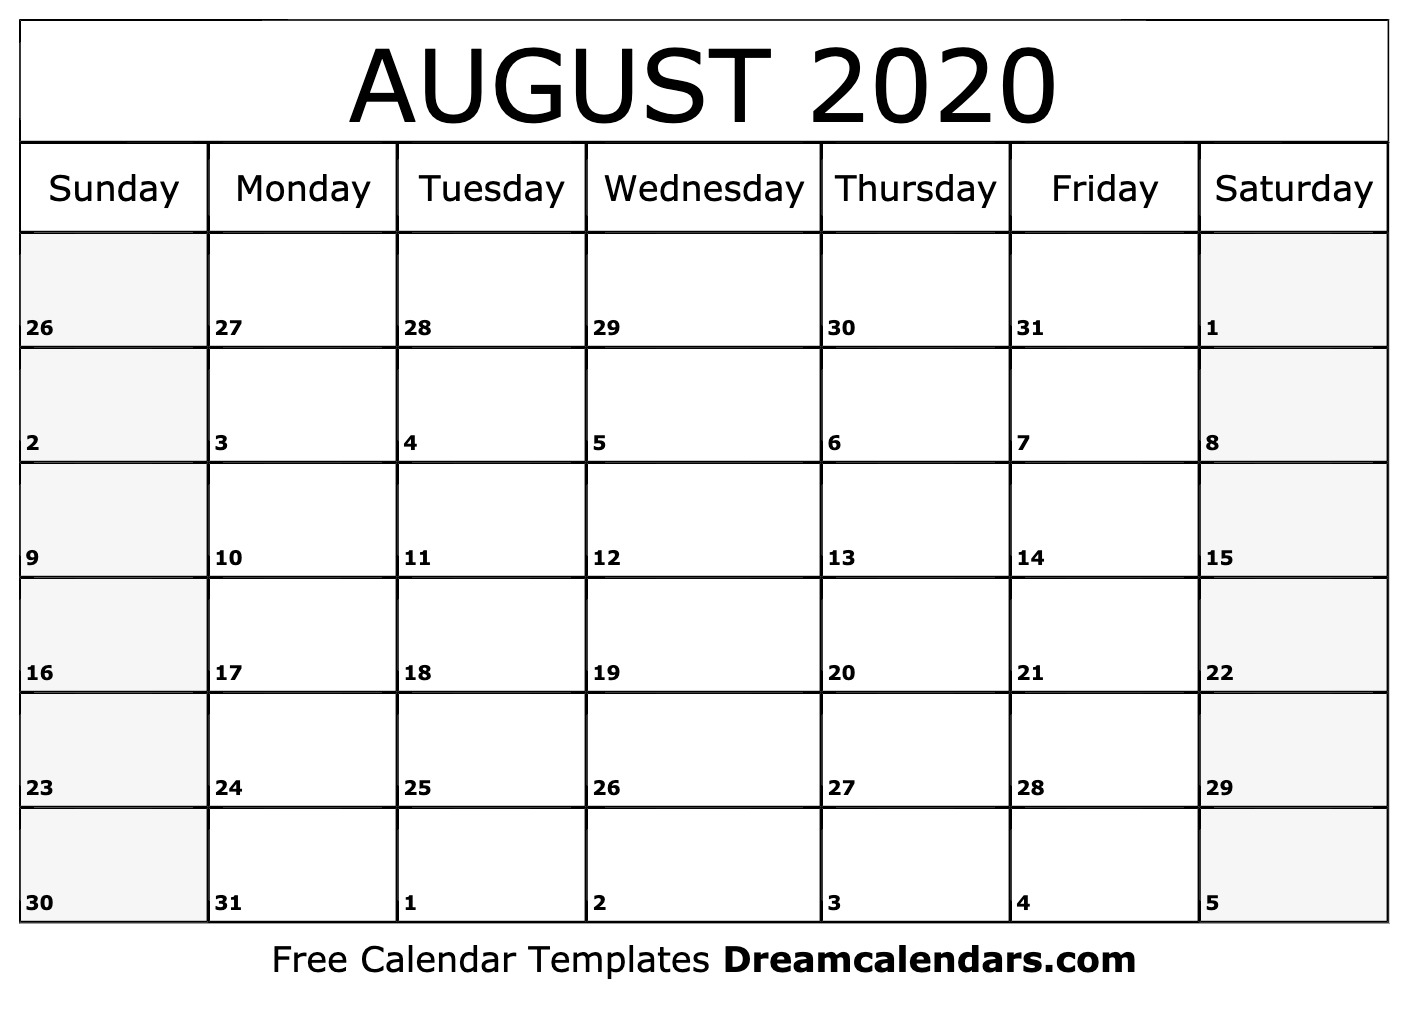 August 2020 Calendar Template Printable August 2020 Calendar